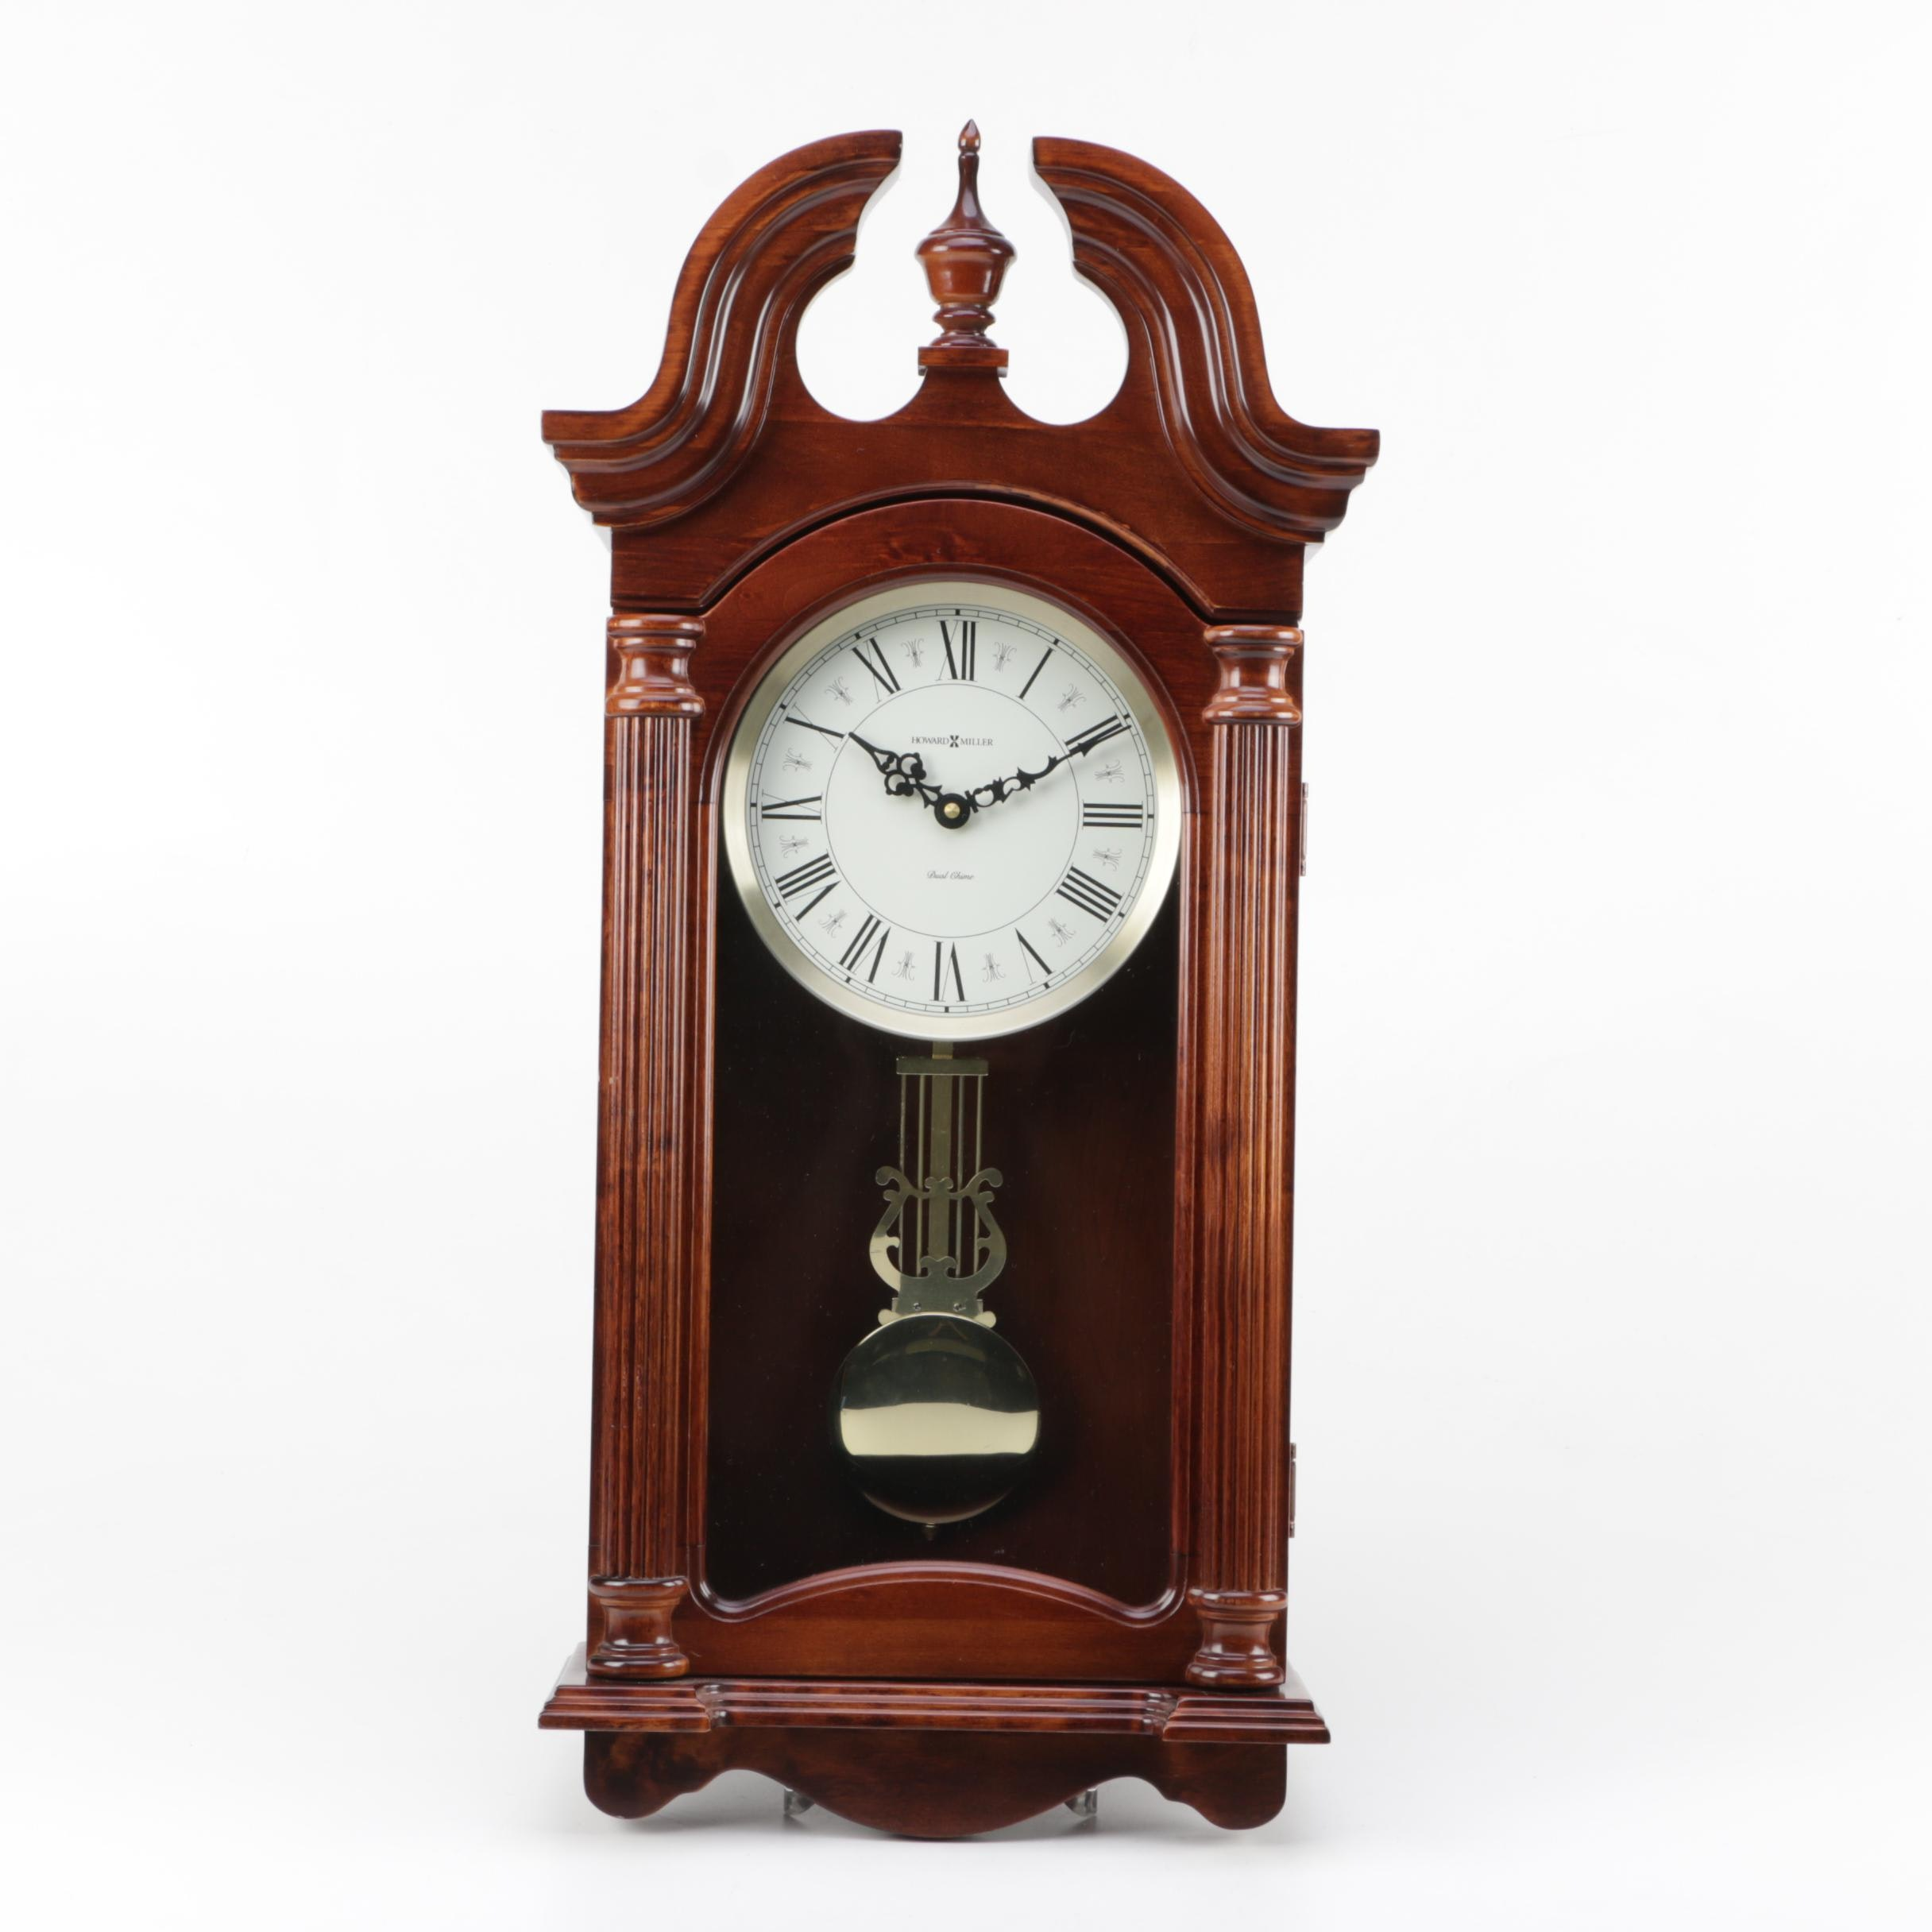 Howard Miller Chiming Wall Clock